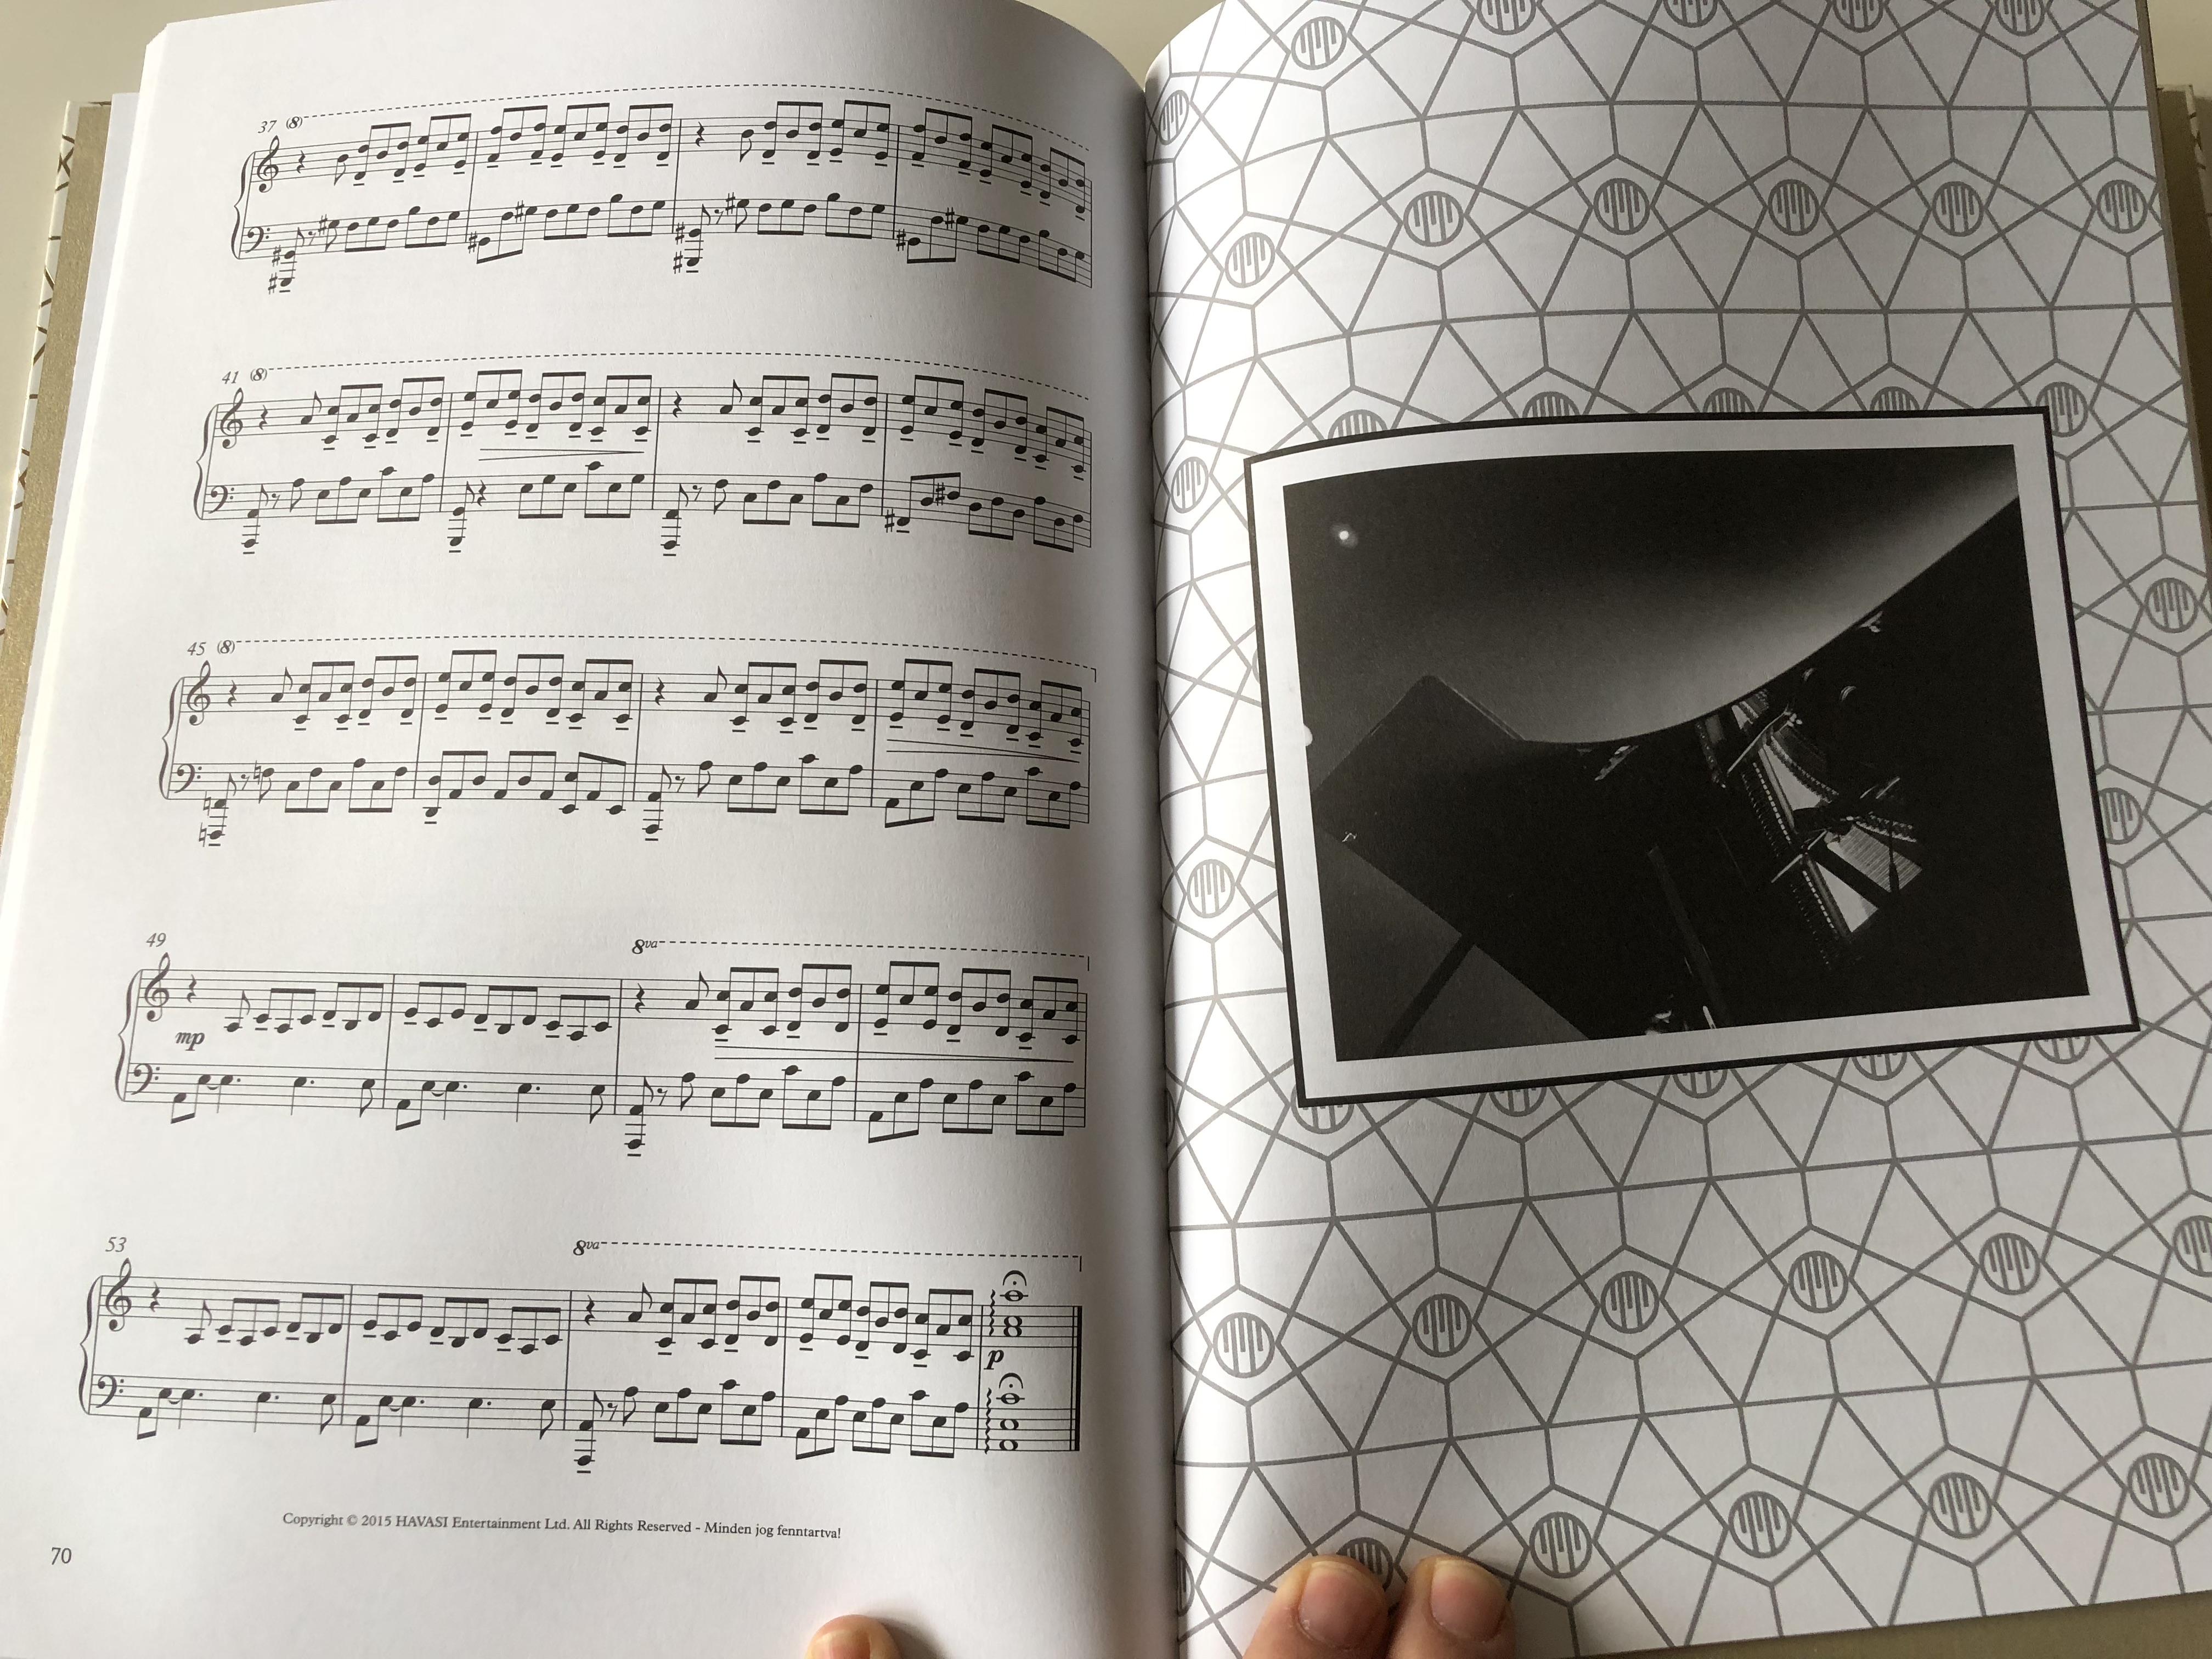 havasi-bal-zs-etudes-1-13-cd-in-piano-sheet-music-book-5-.jpg